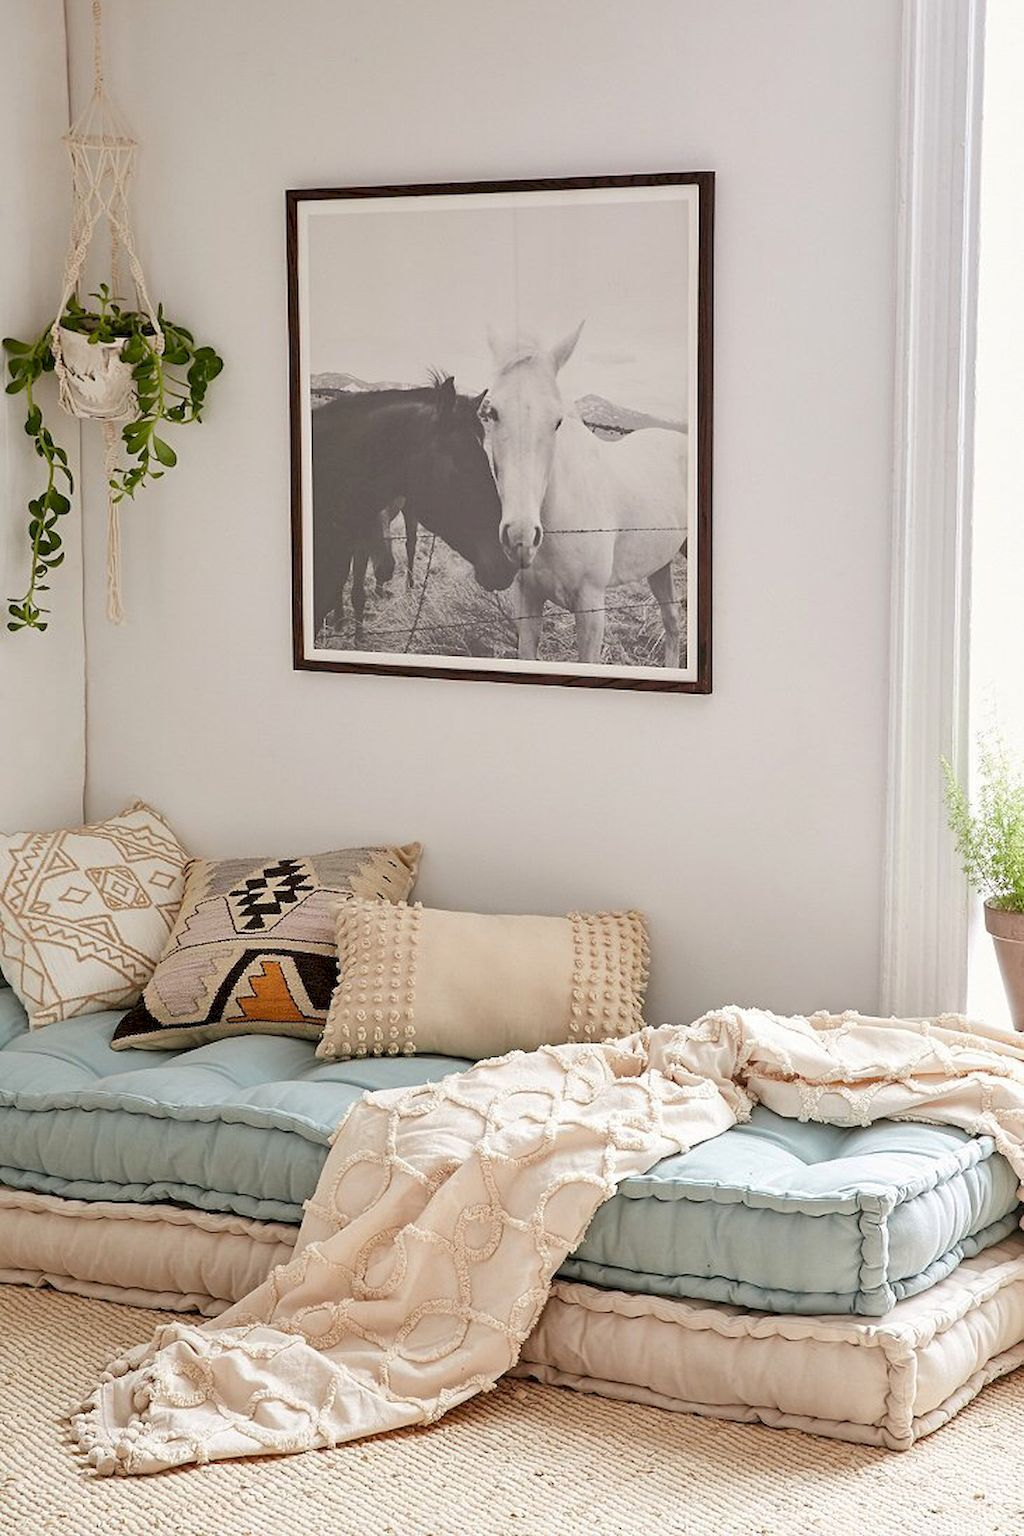 Bedroom Design On A Budget 16 Photo Image